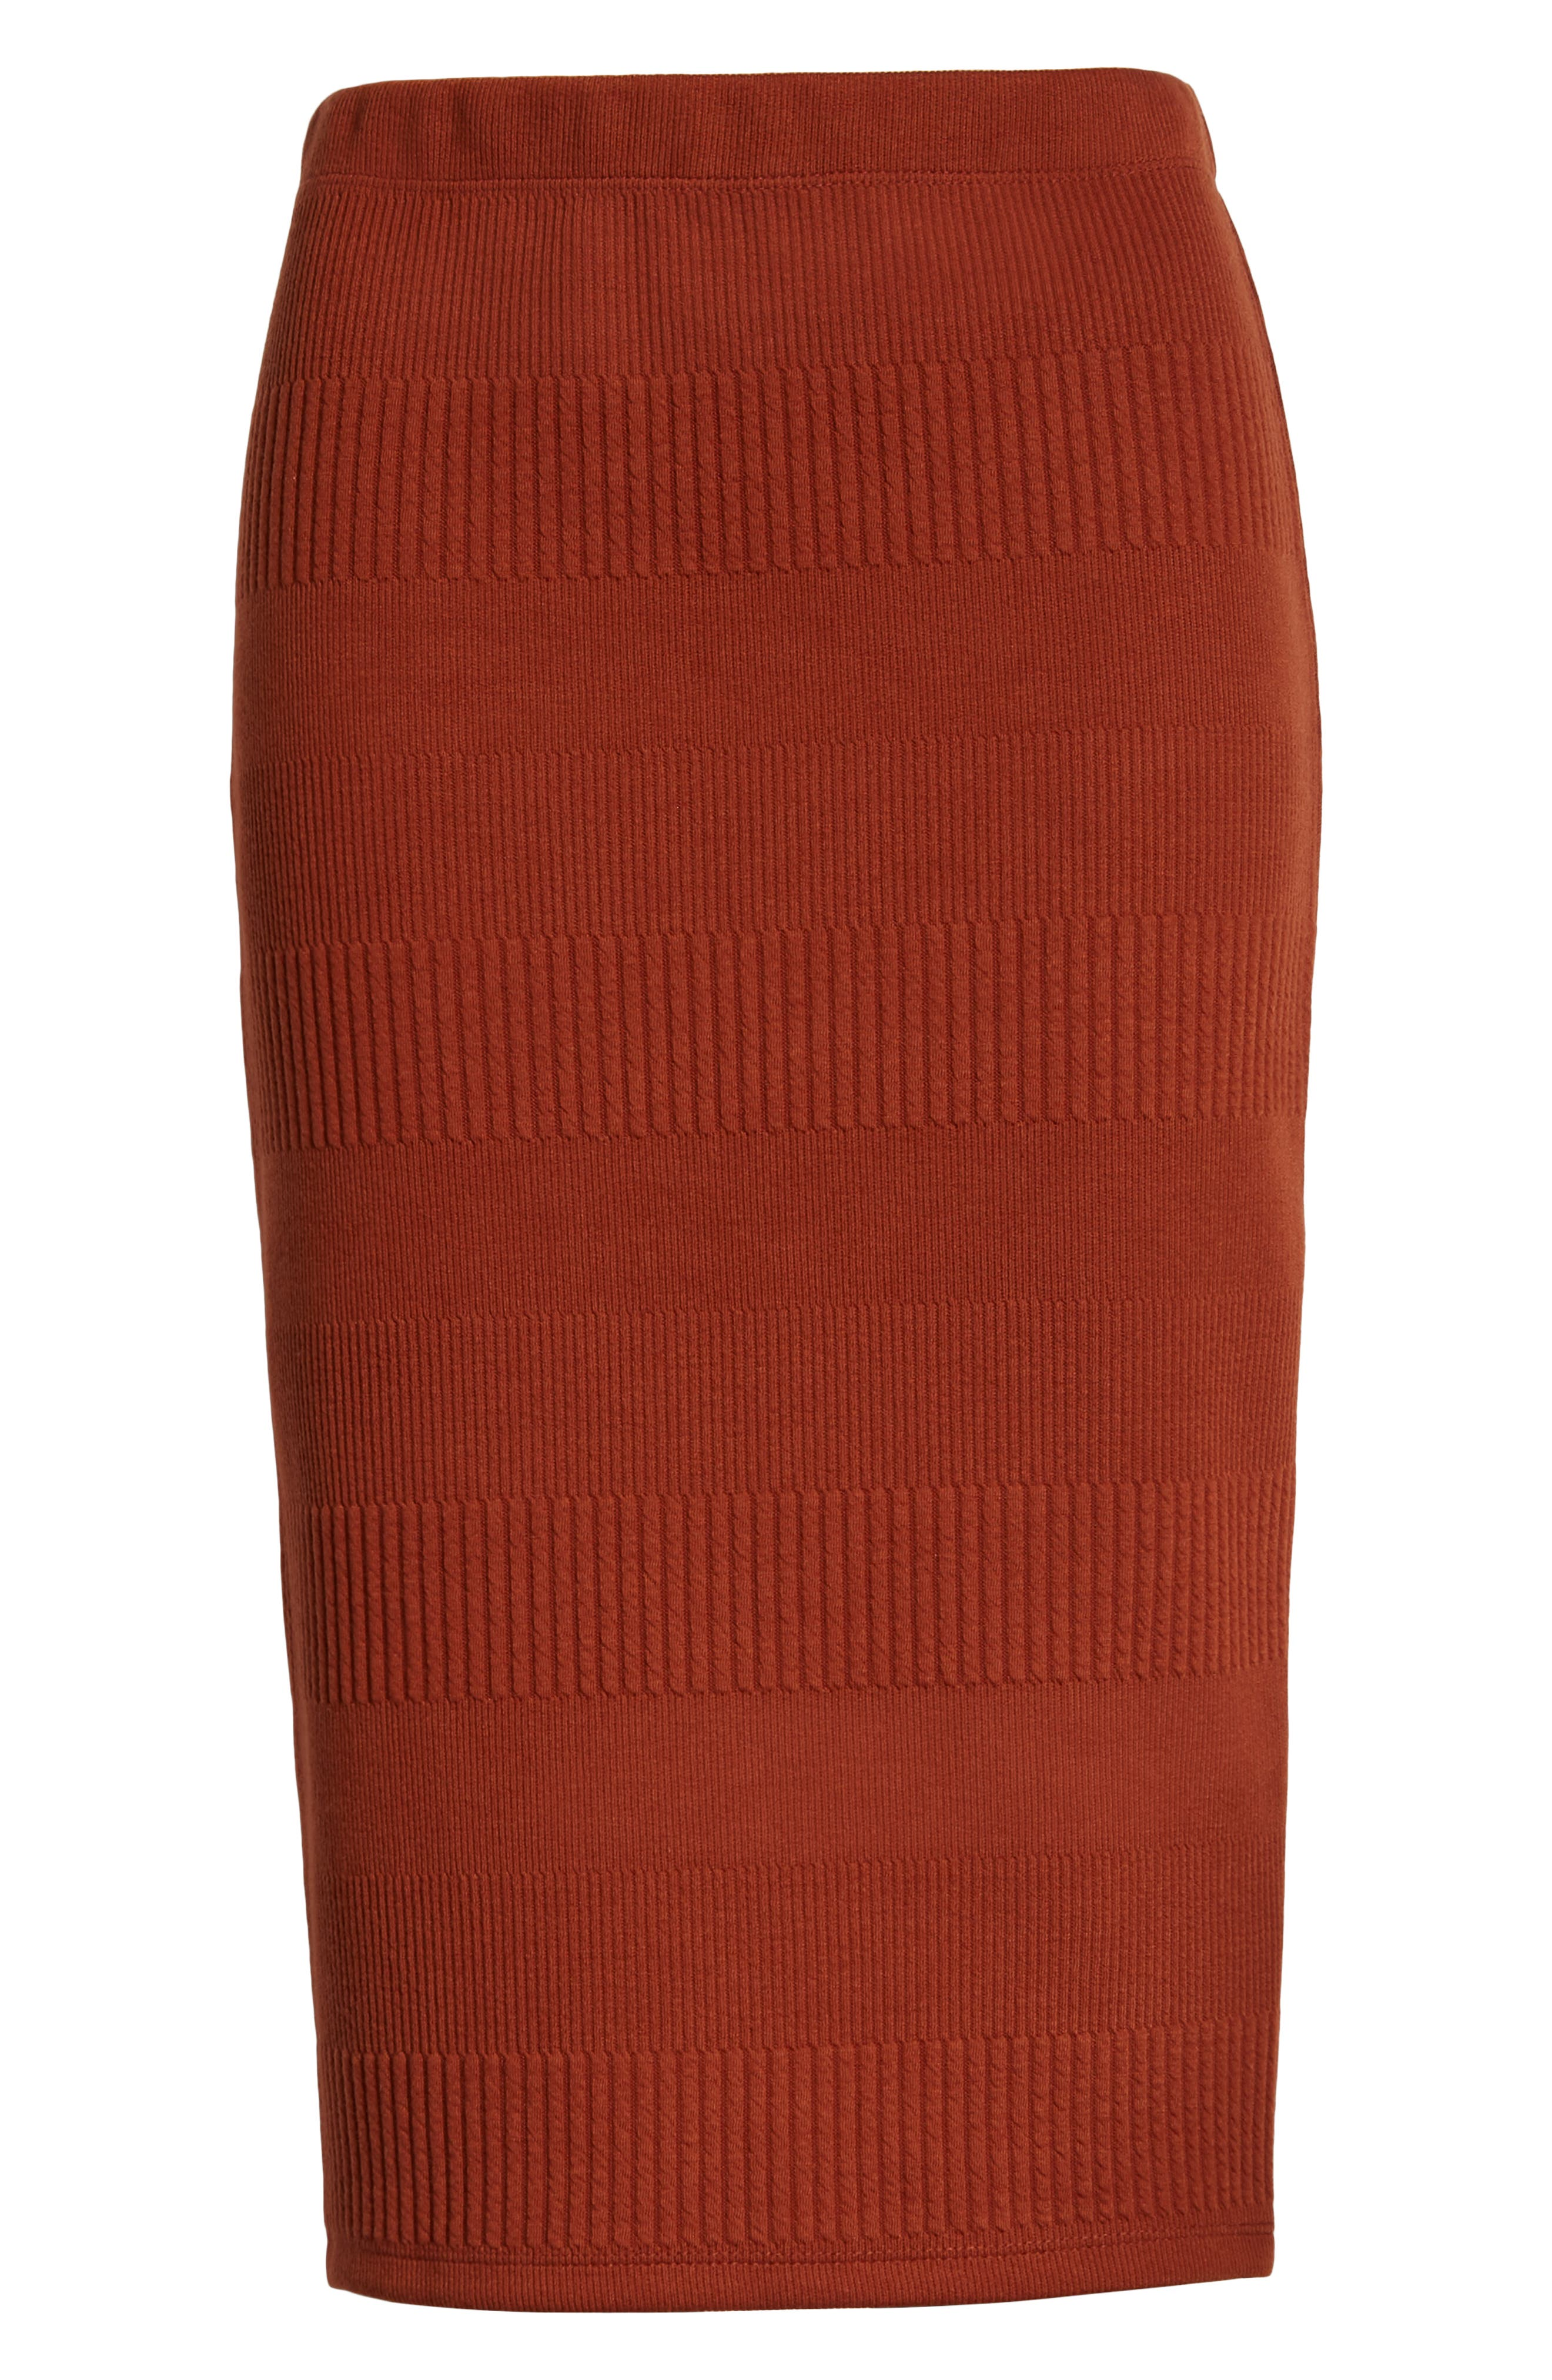 Midi Pencil Skirt,                             Alternate thumbnail 6, color,                             BROWN SPICE